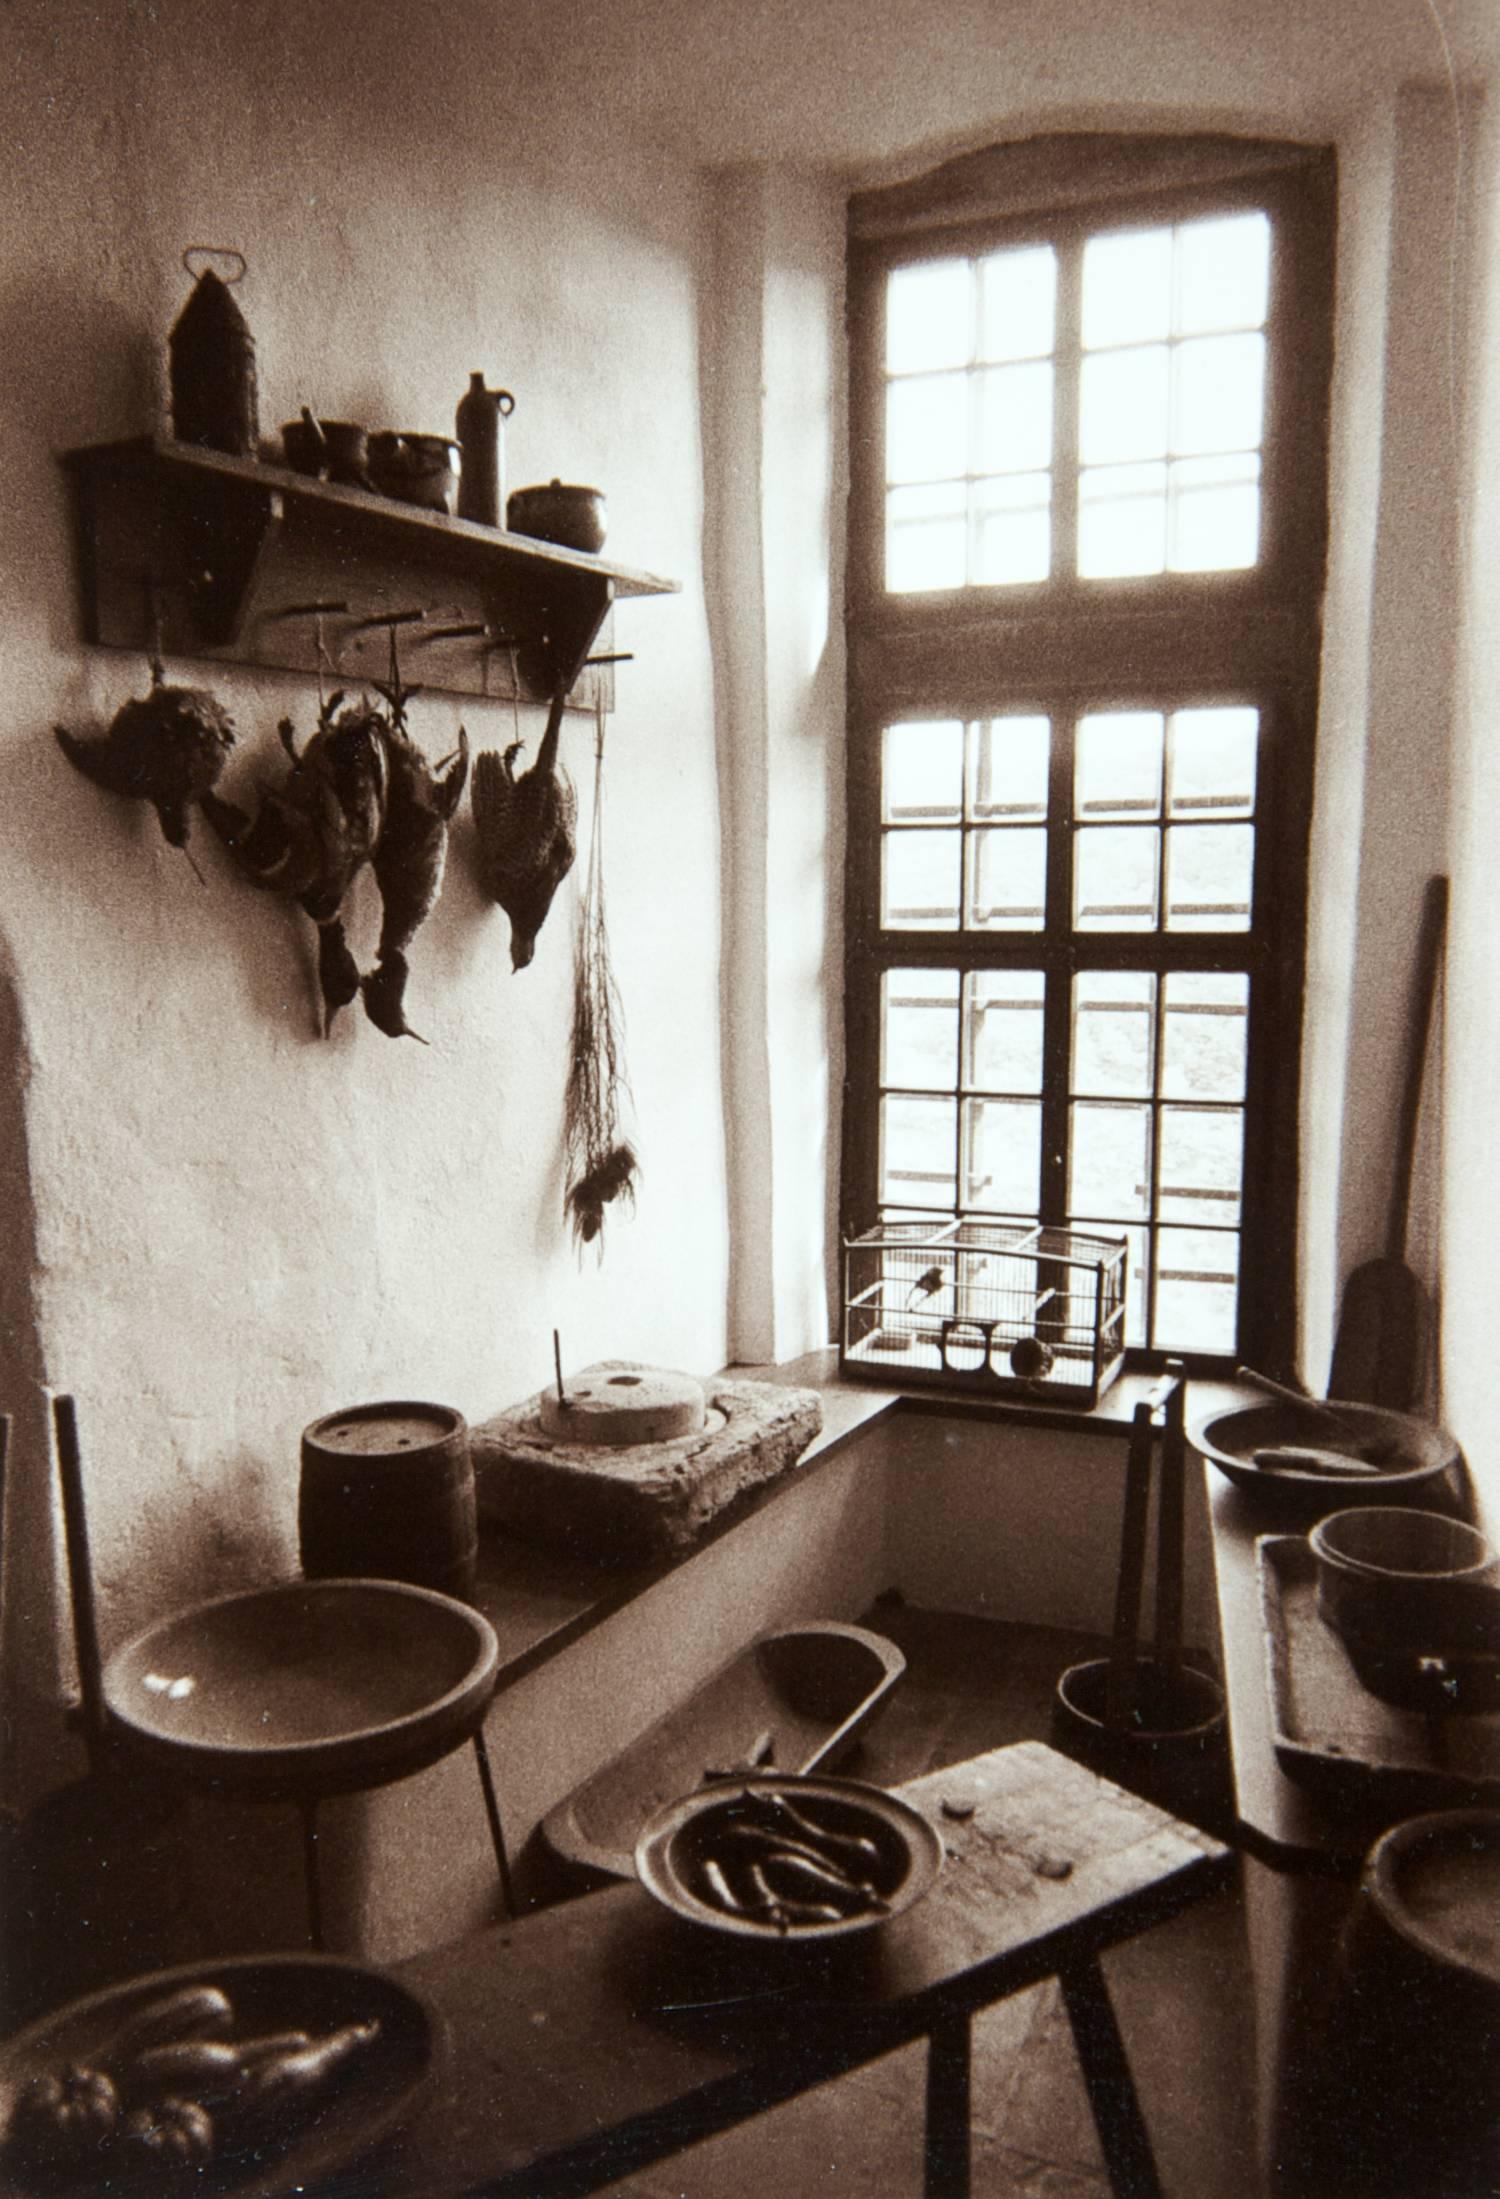 Kitchen (Marksburg Castle, Germany)